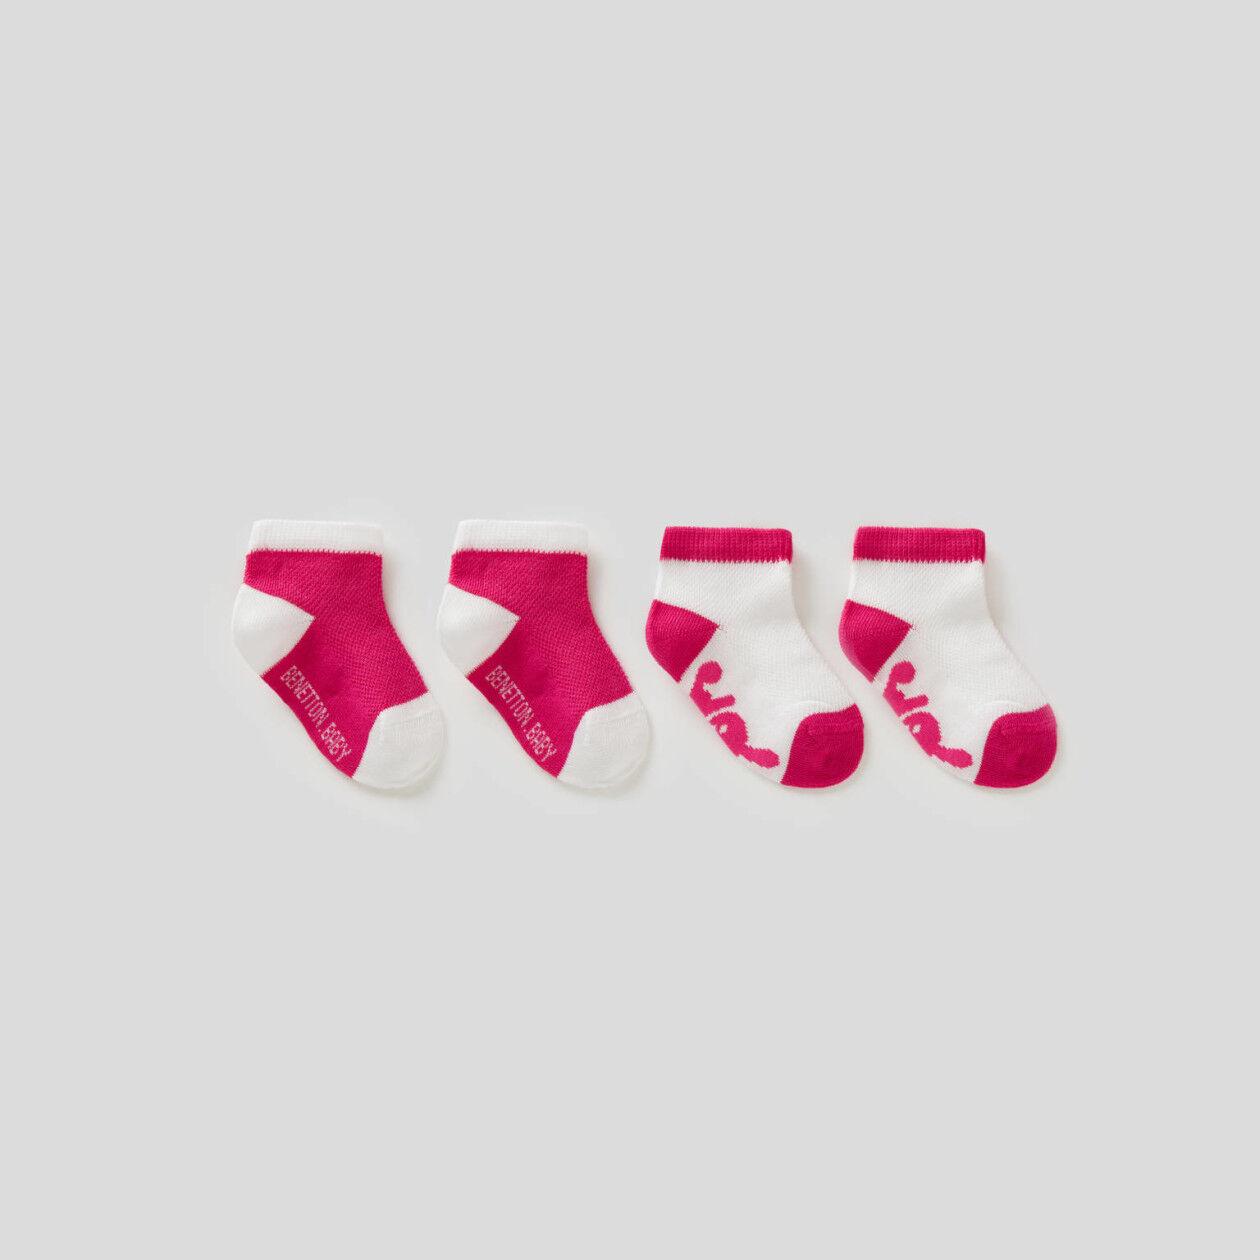 Pack de calcetines en dos colores